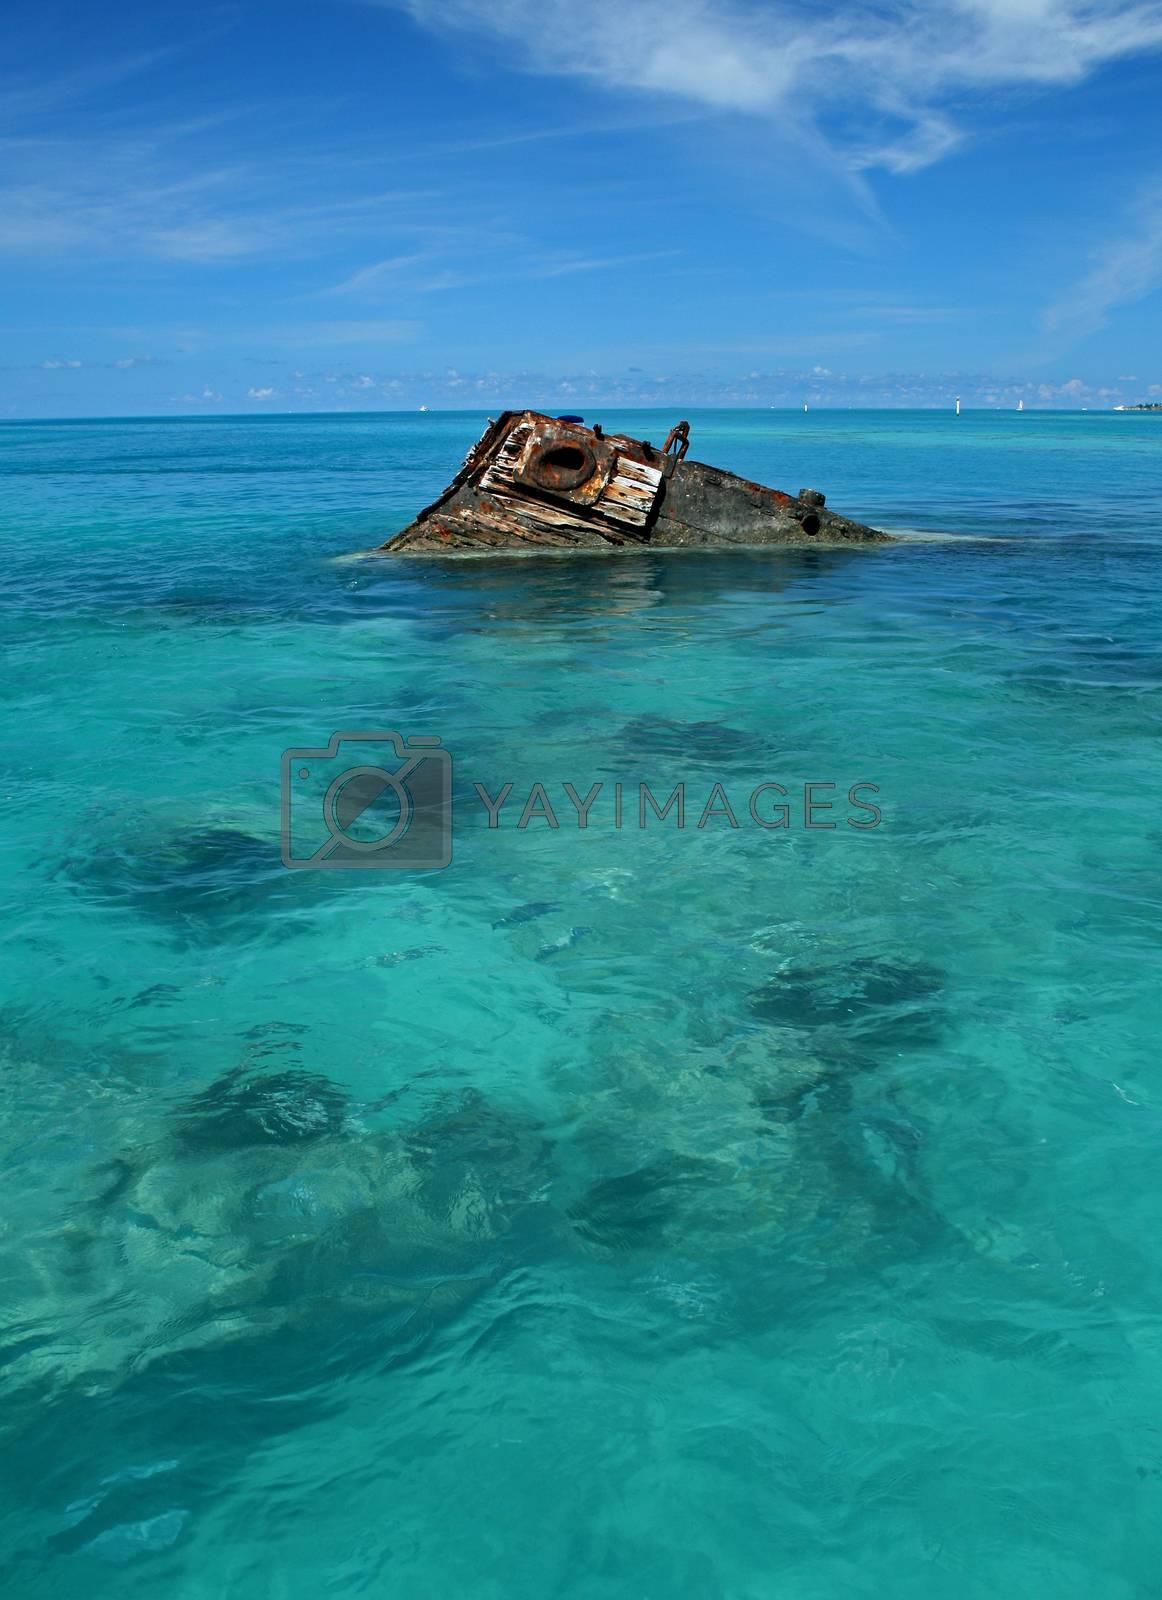 One end of a ship wreck (the Vixen) emerging from a tropical Sea